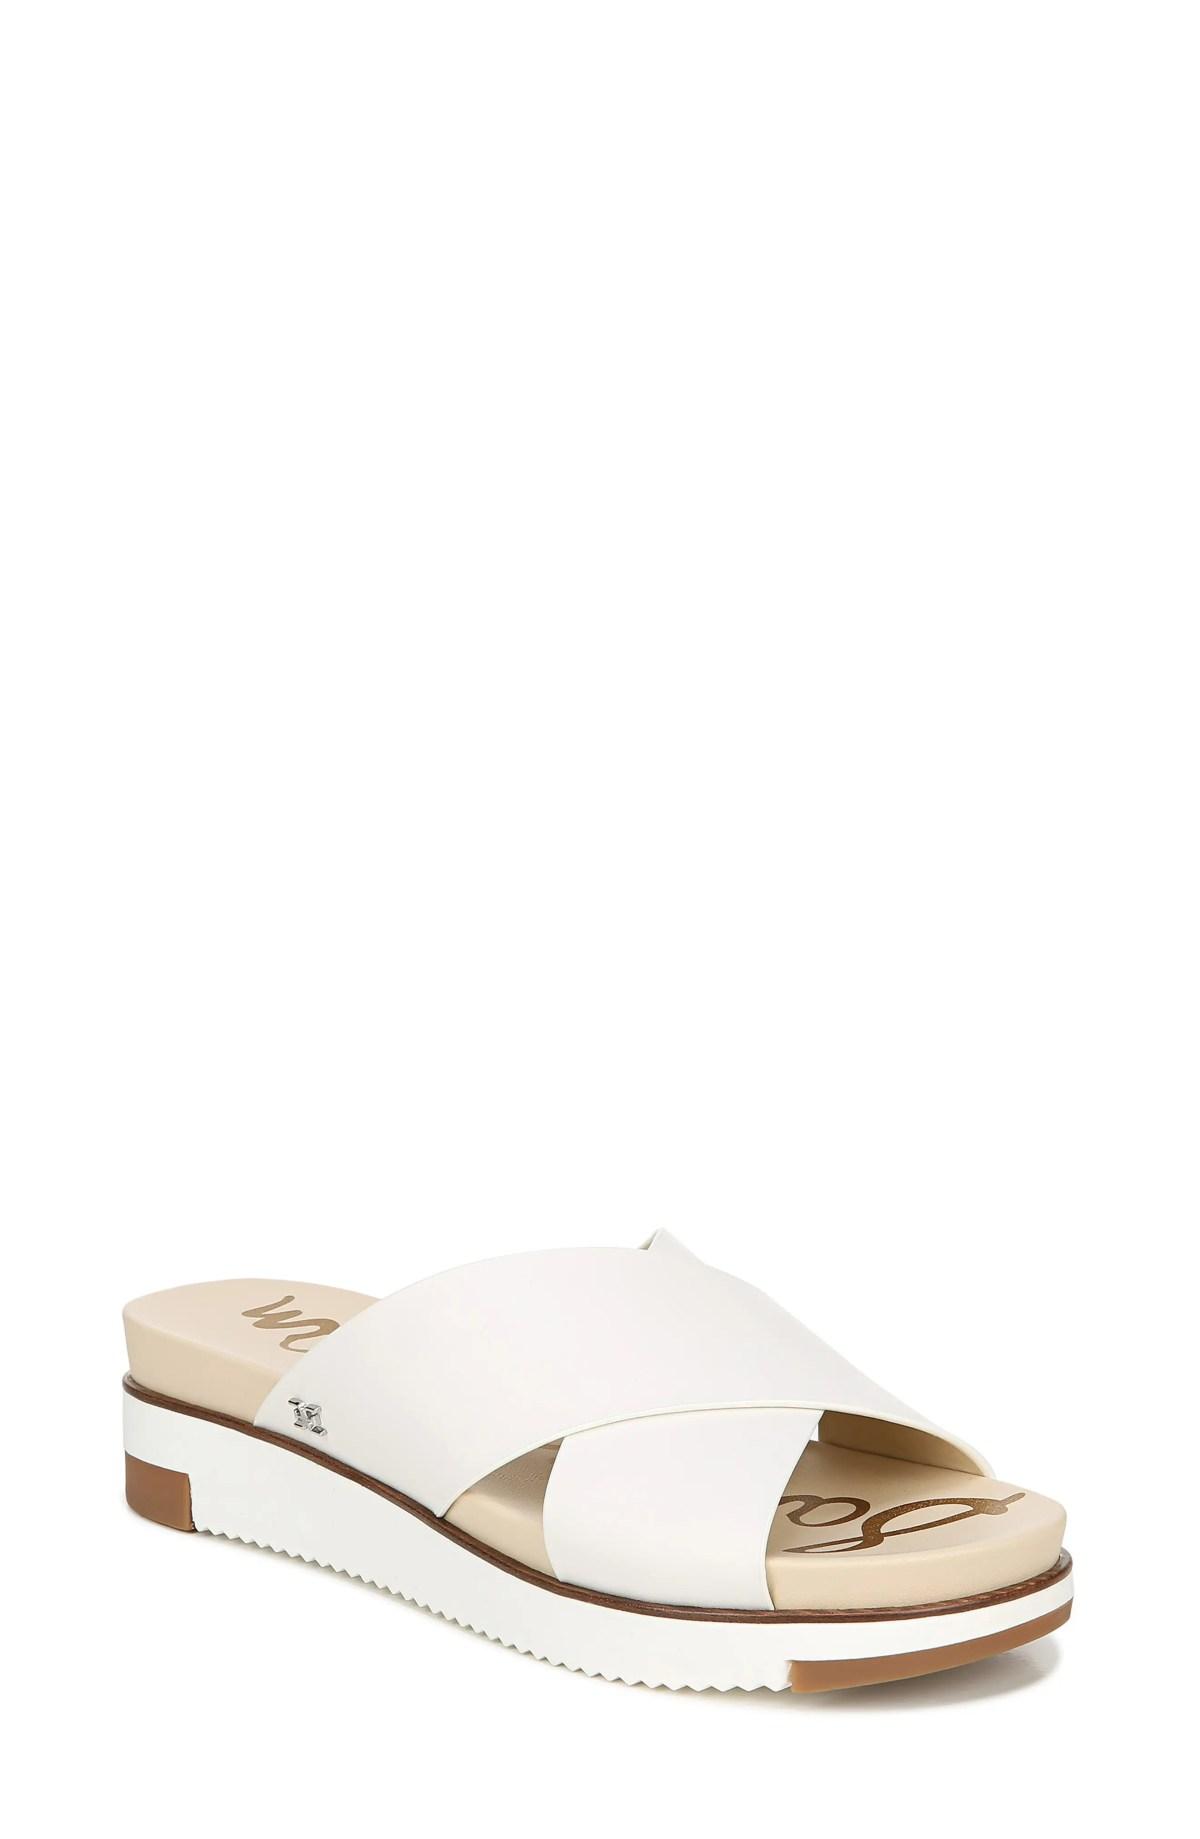 SAM EDELMAN Audrea Slide Sandal, Main, color, BRIGHT WHITE LEATHER